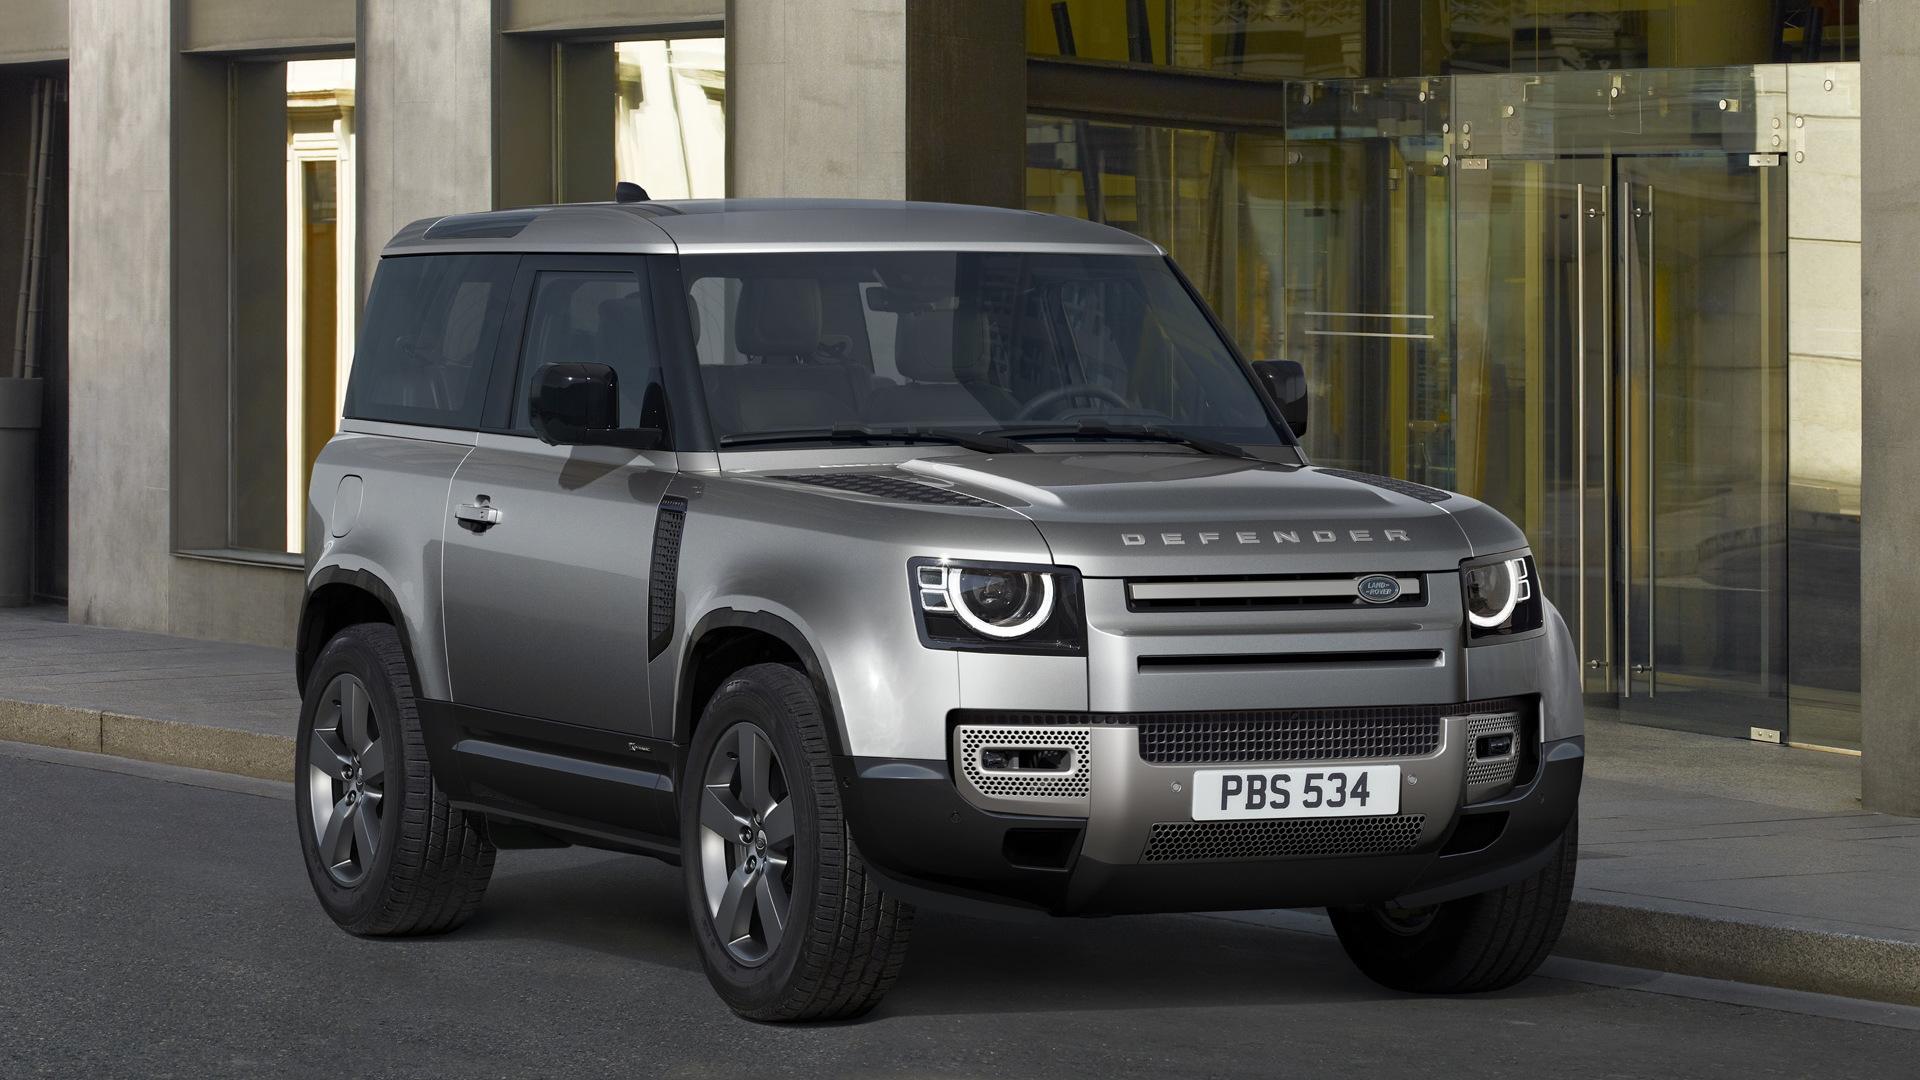 2021 Land Rover Defender Spesification